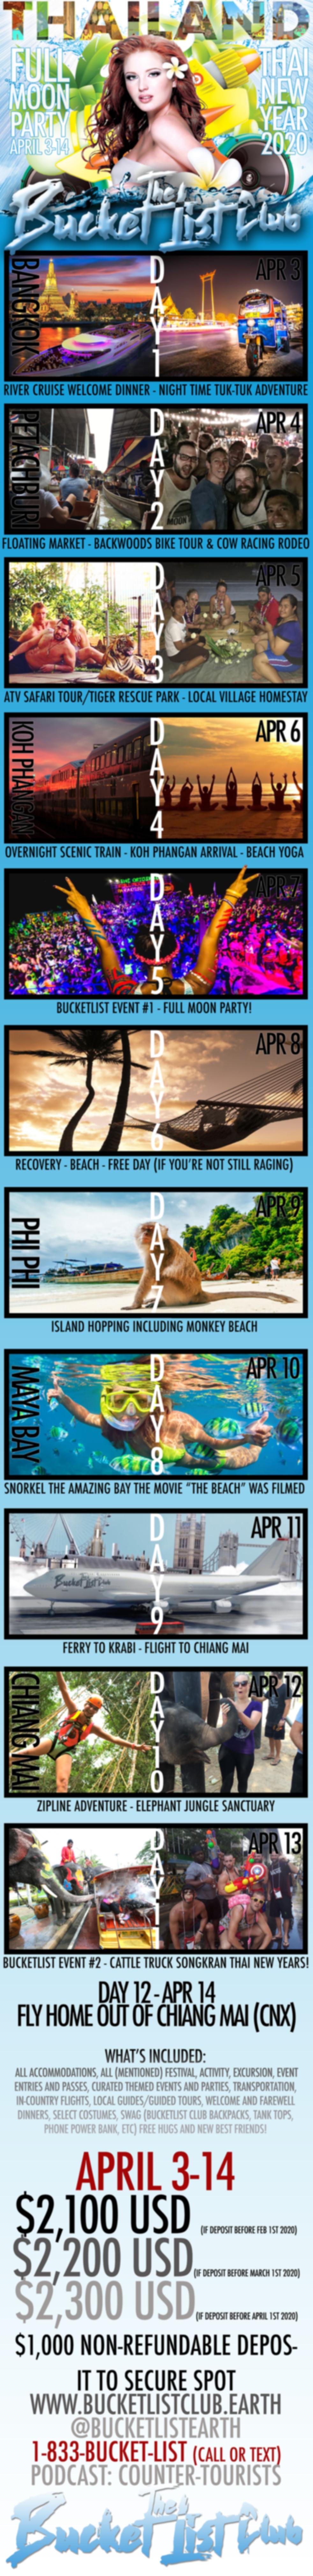 thAiland itinerary.jpg